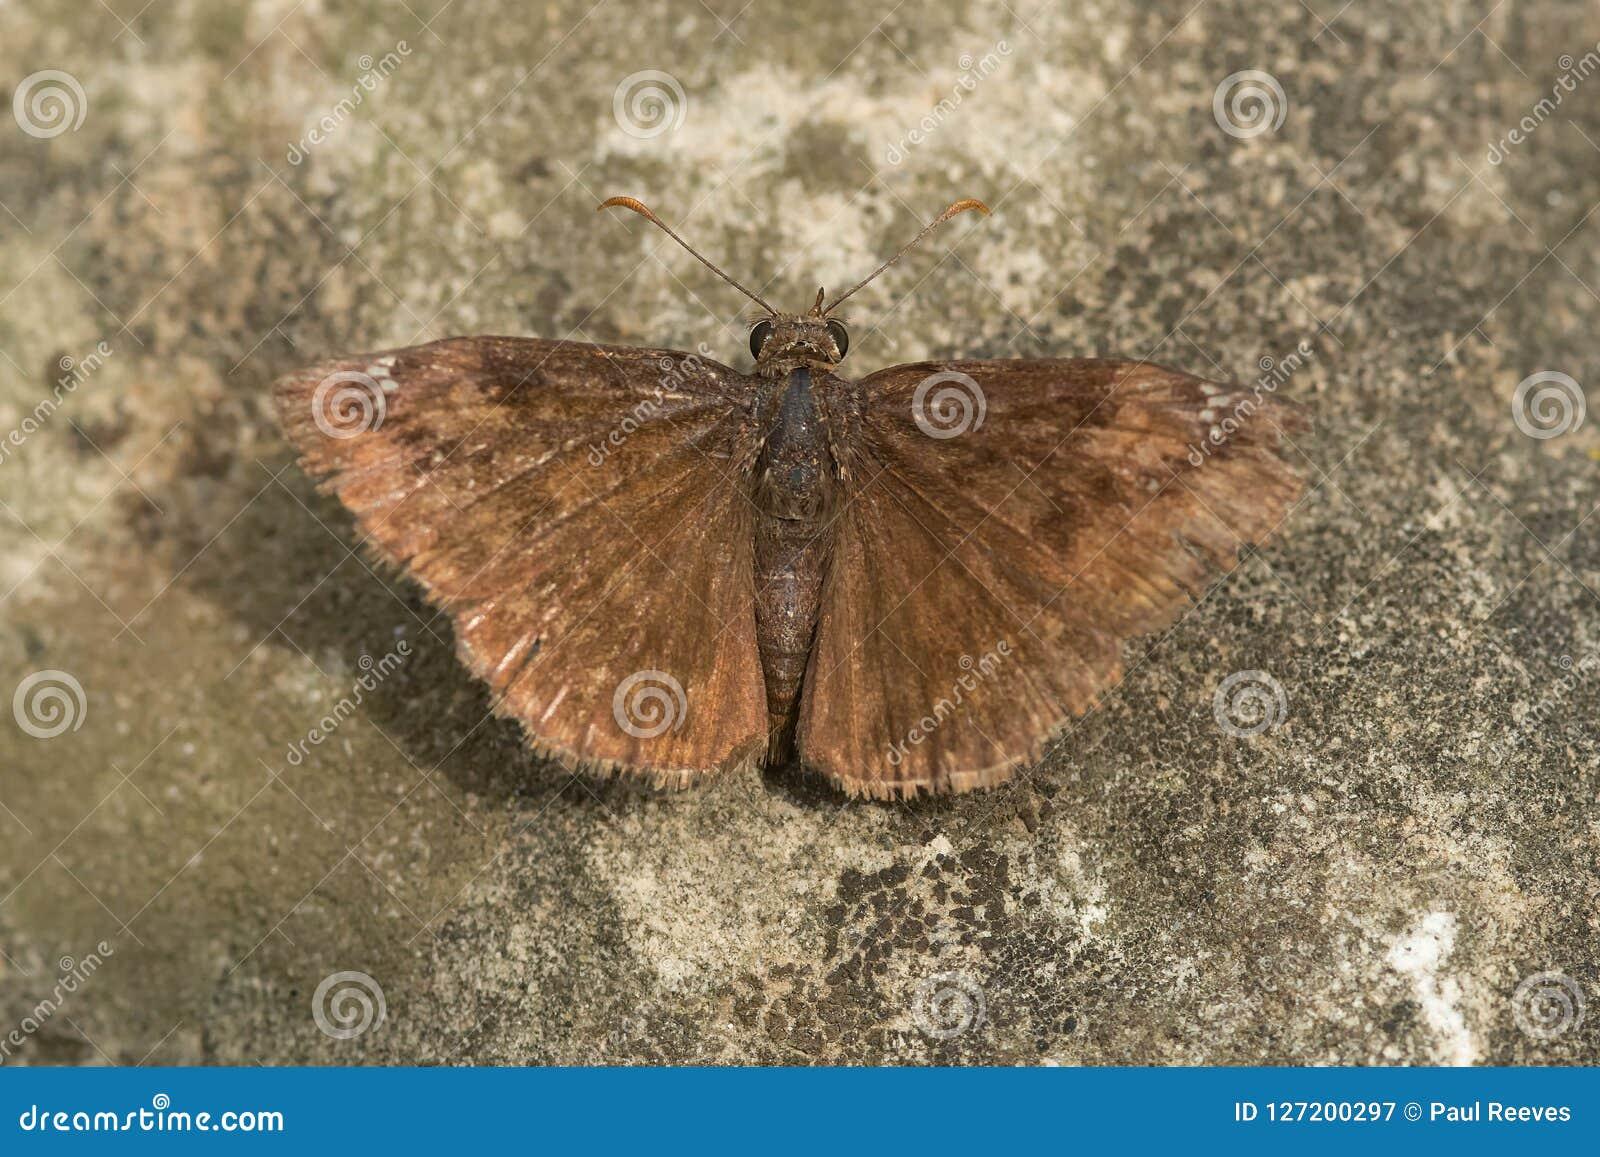 Wild Indigo Duskywing butterfly   Flickr - Photo Sharing!